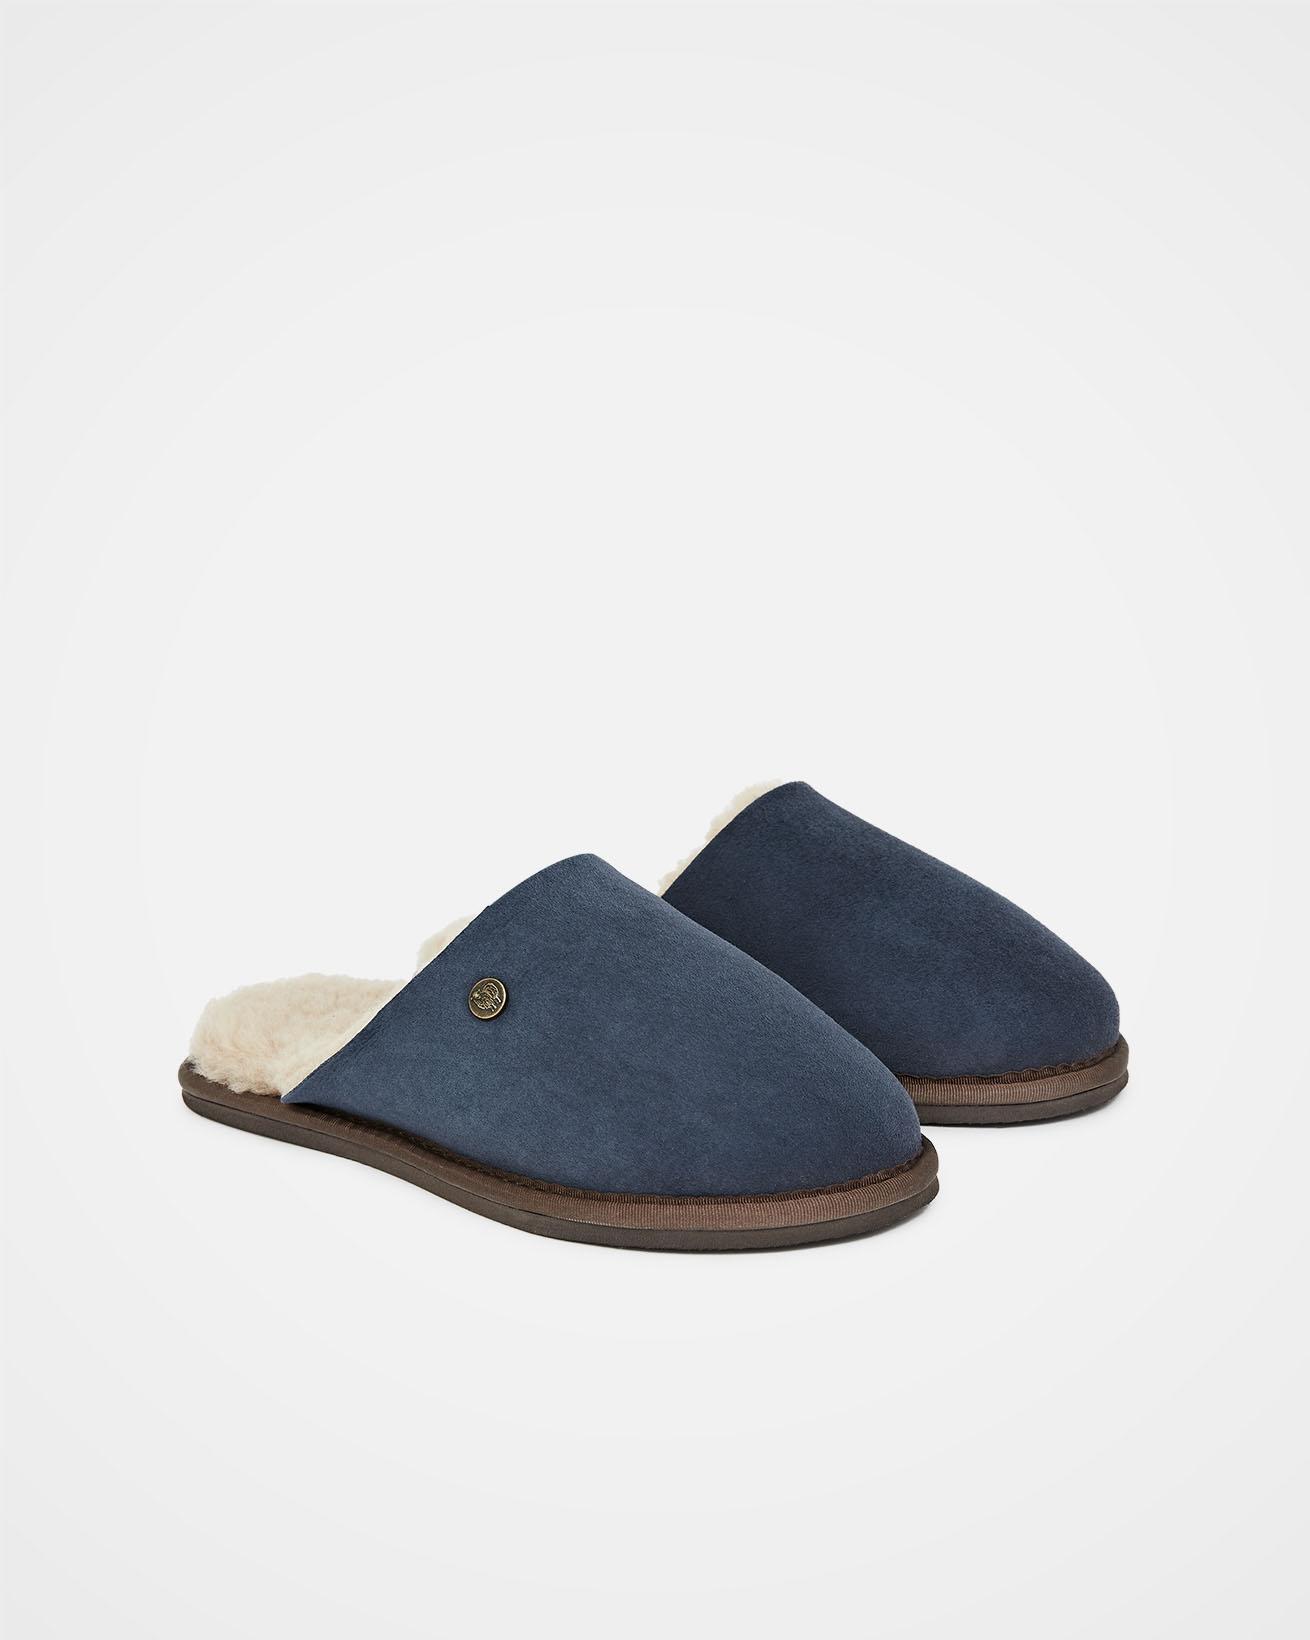 6615_ladies-sheepskin-mules_blue-iris_pair_web_v2.jpg